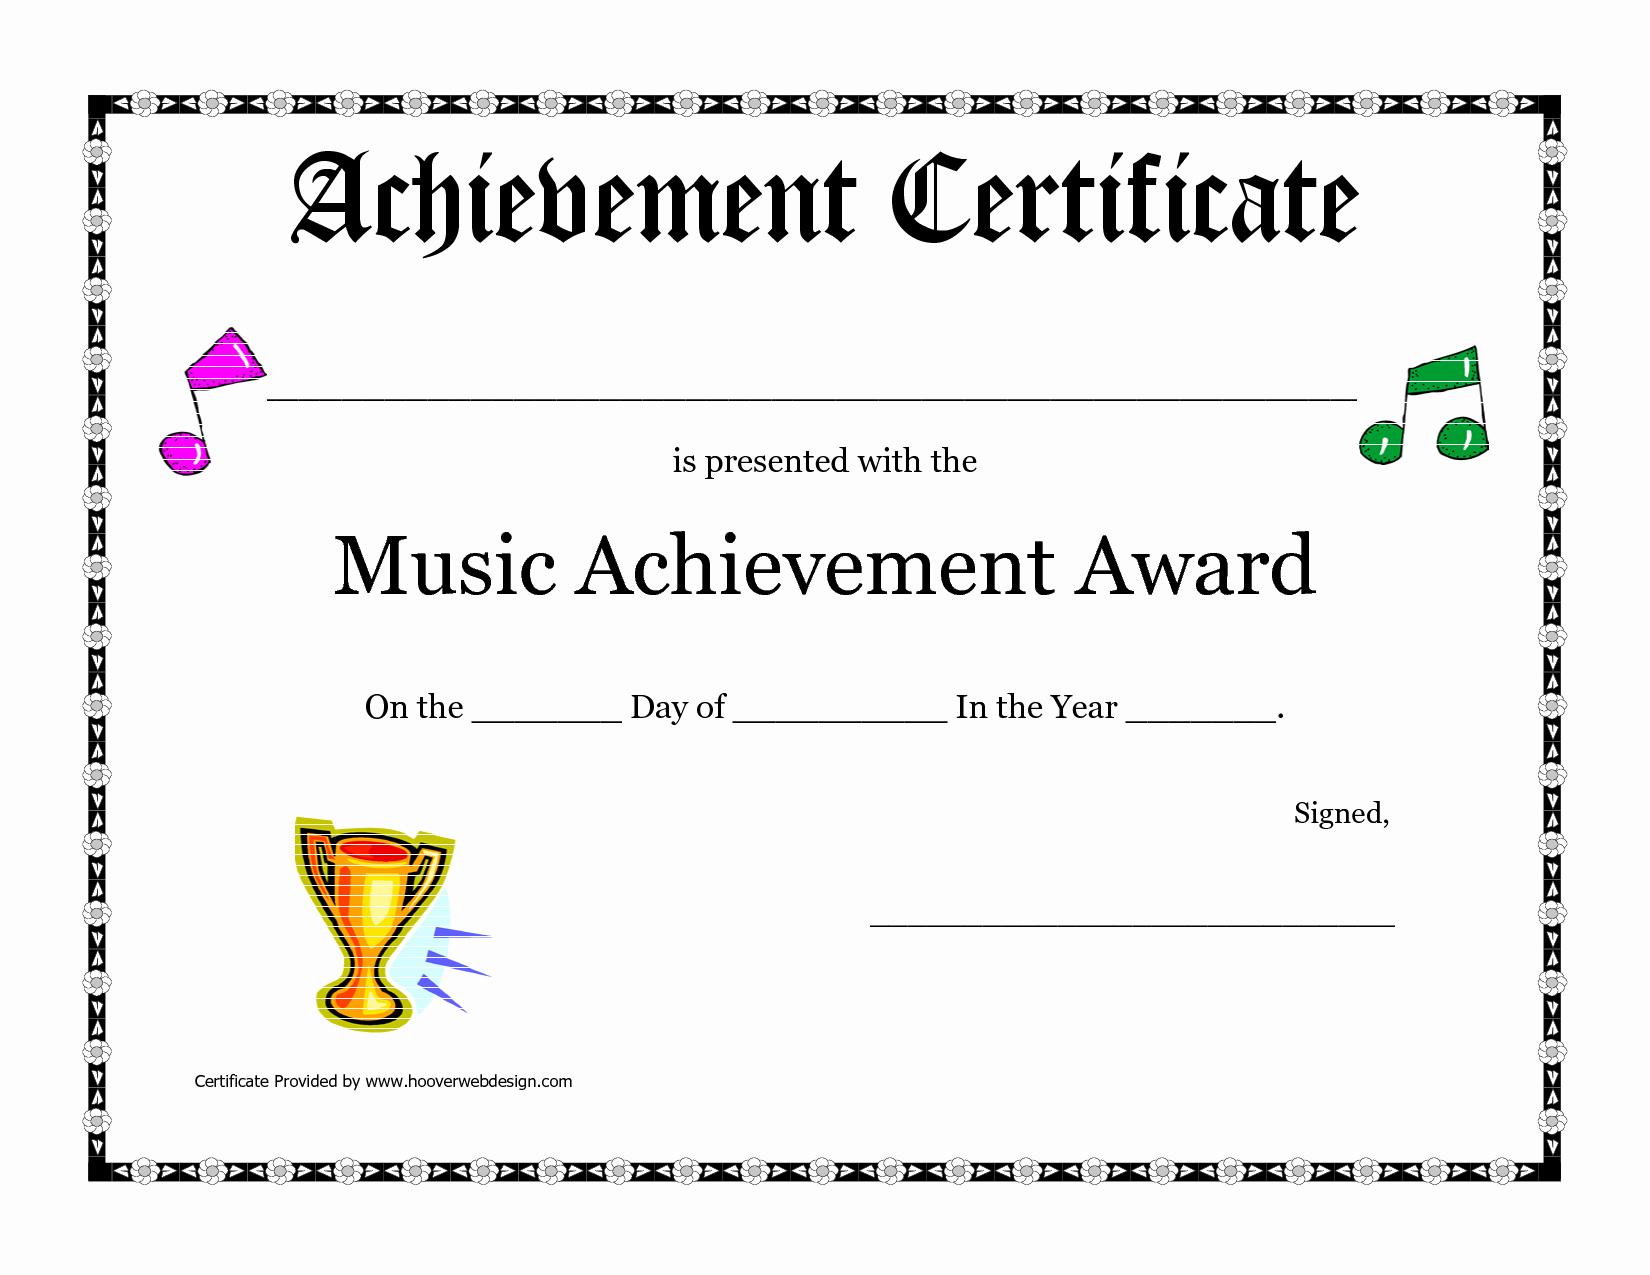 Certificate Of Accomplishment Template Beautiful Free Printable Achievement Award Certificate Template